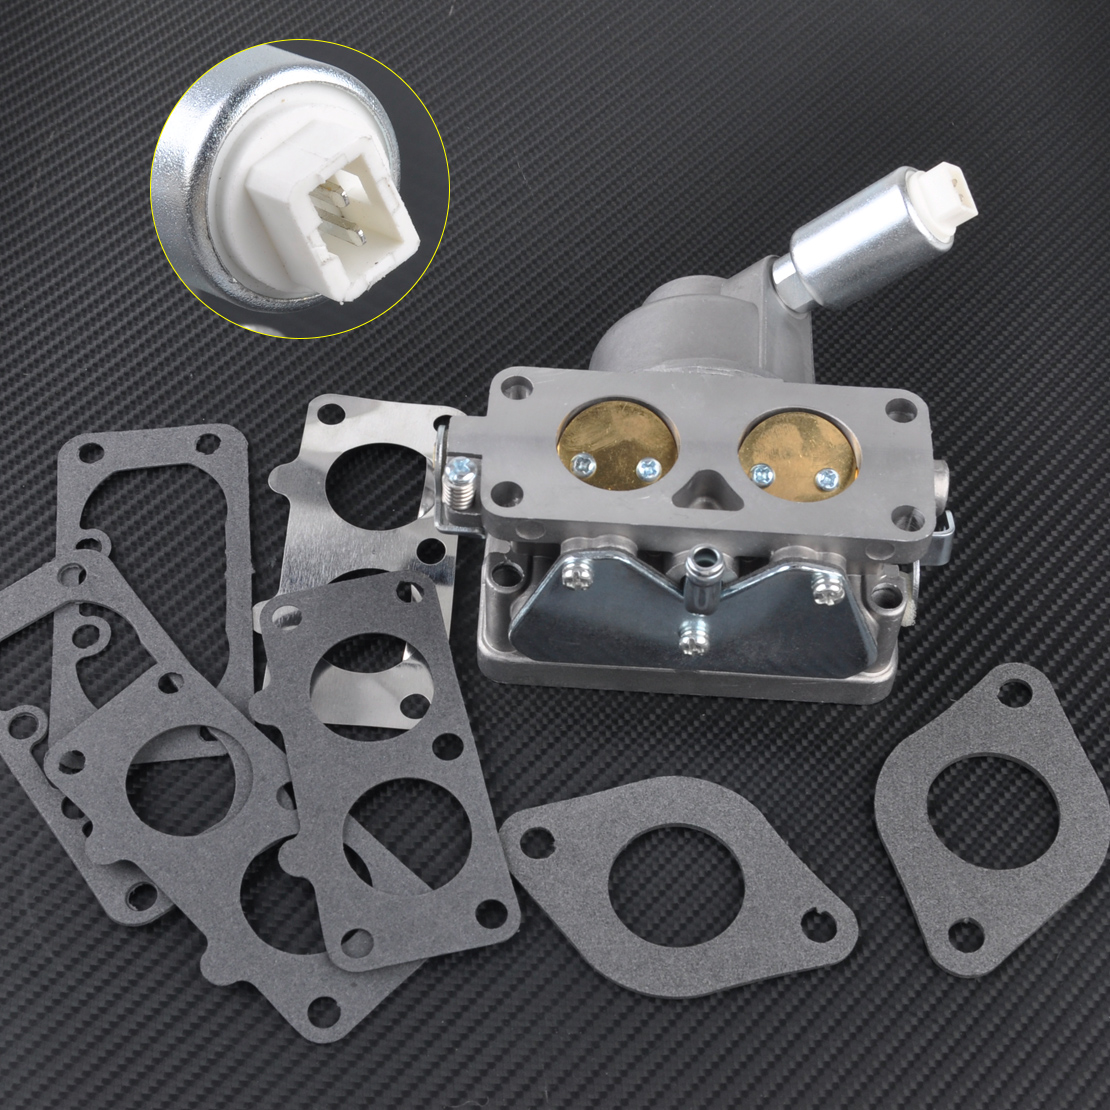 все цены на LETAOSK New Carburetor Replaces fit for Briggs & Stratton 791230 699709 499804 Manual Choke